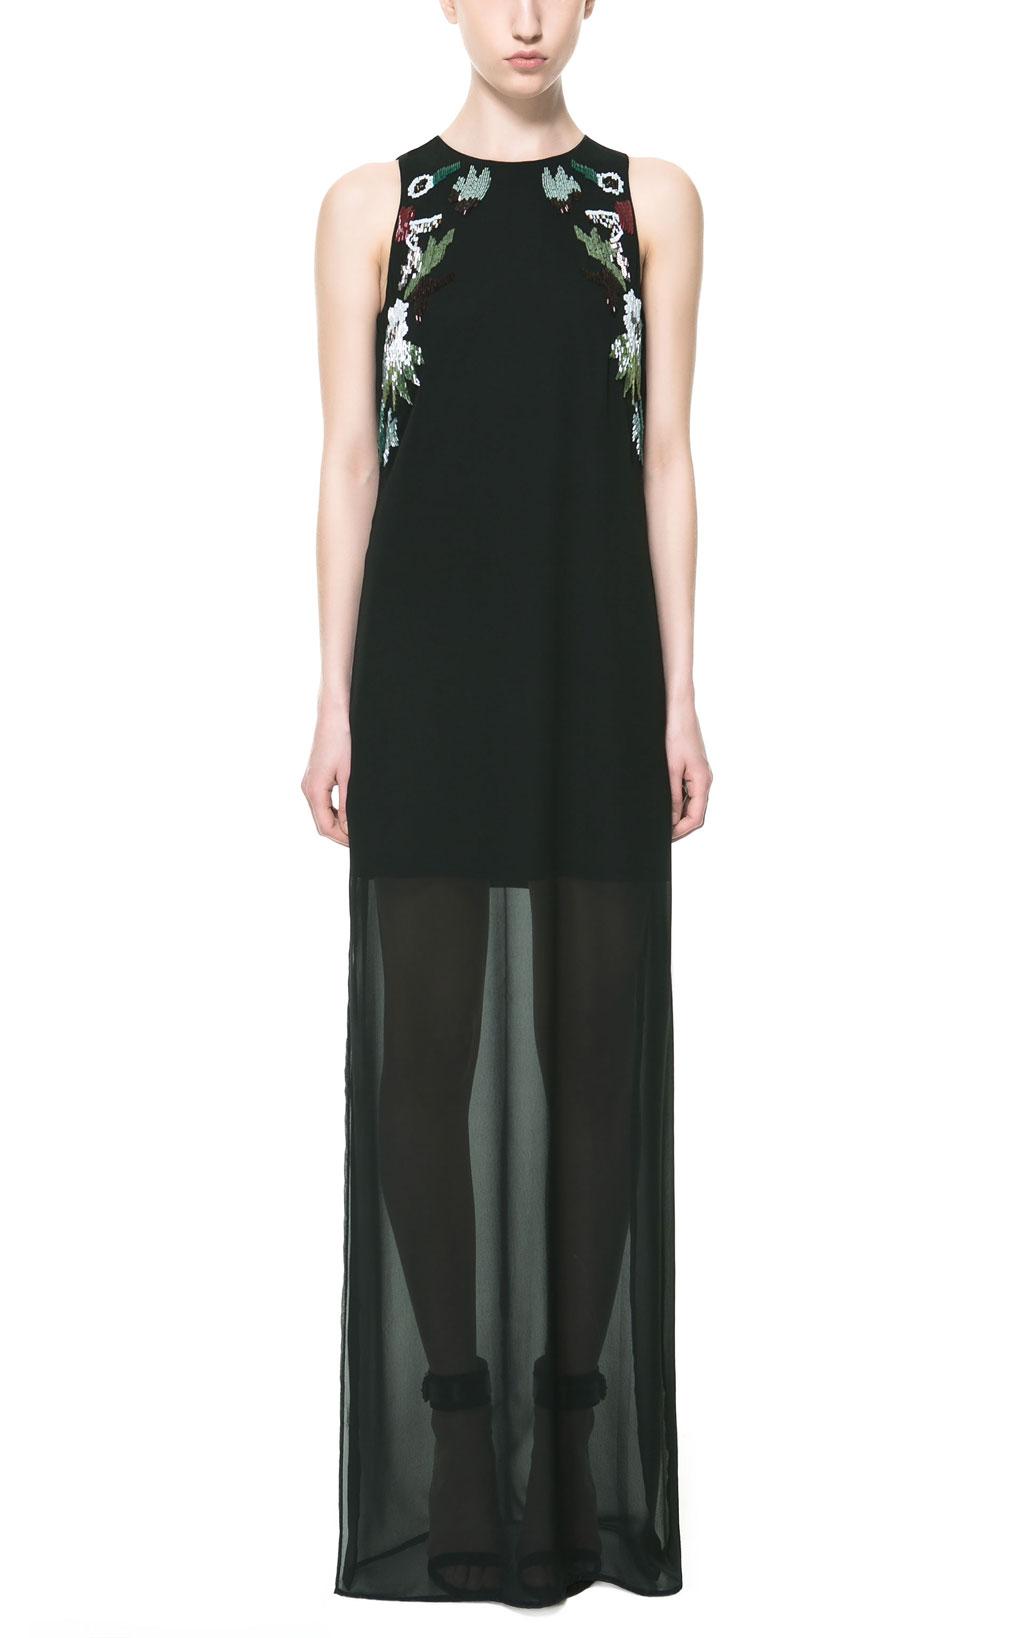 Zara Kleider 2020 - Damenbekleidung.de